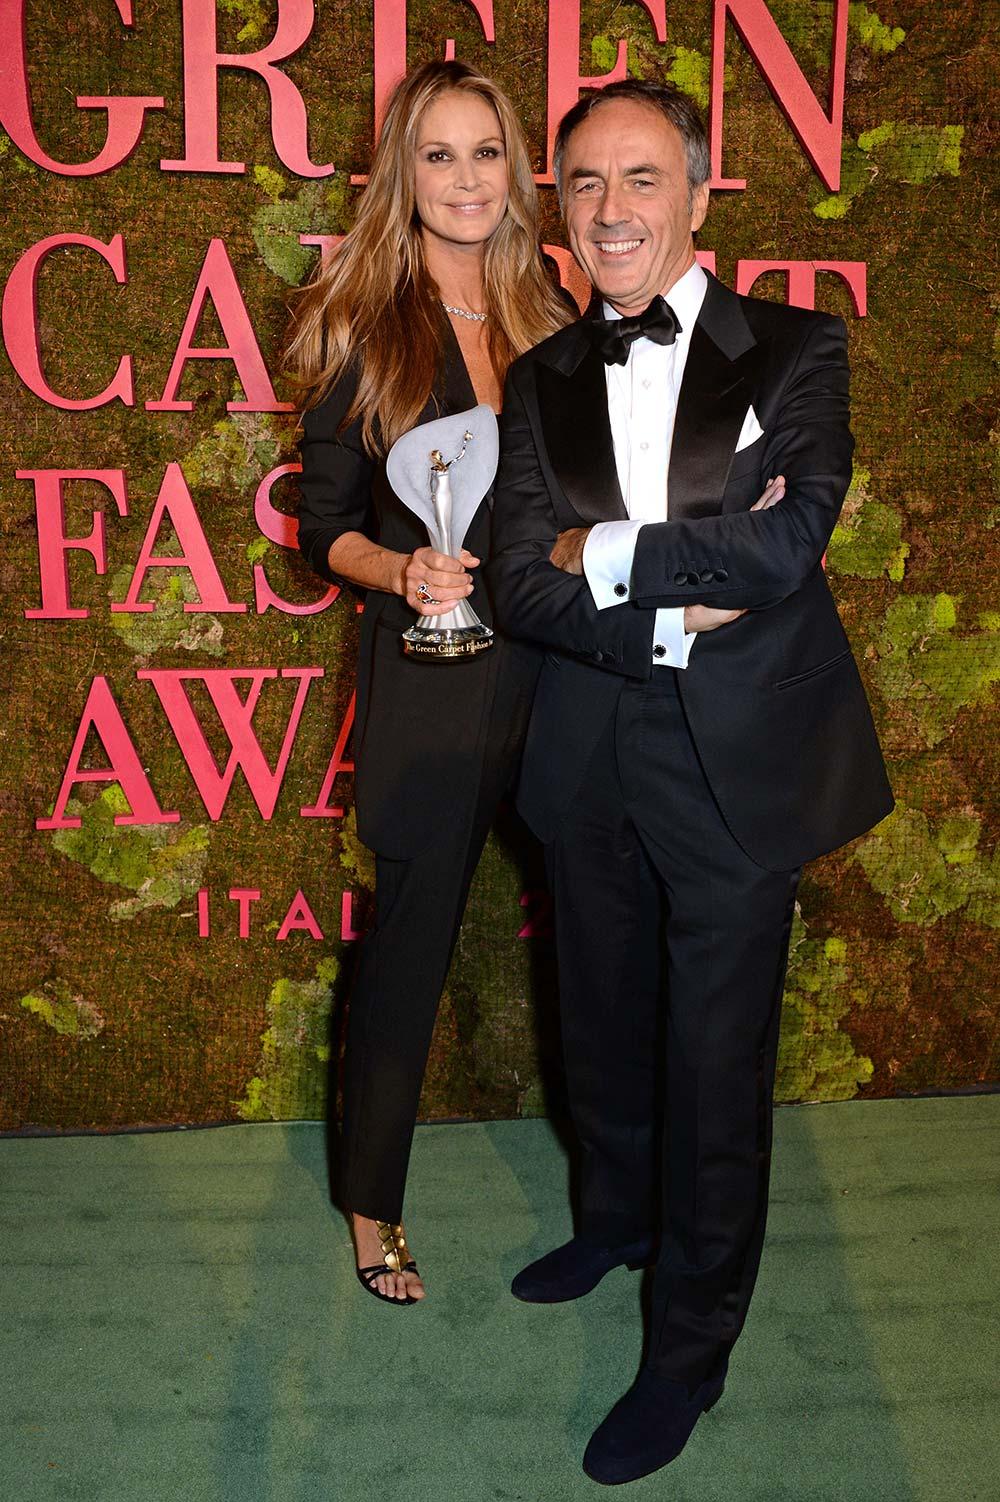 Green Carpet Fashion Awards 2018 - Elle McPherson - Hair & Makeup Massimo Serini